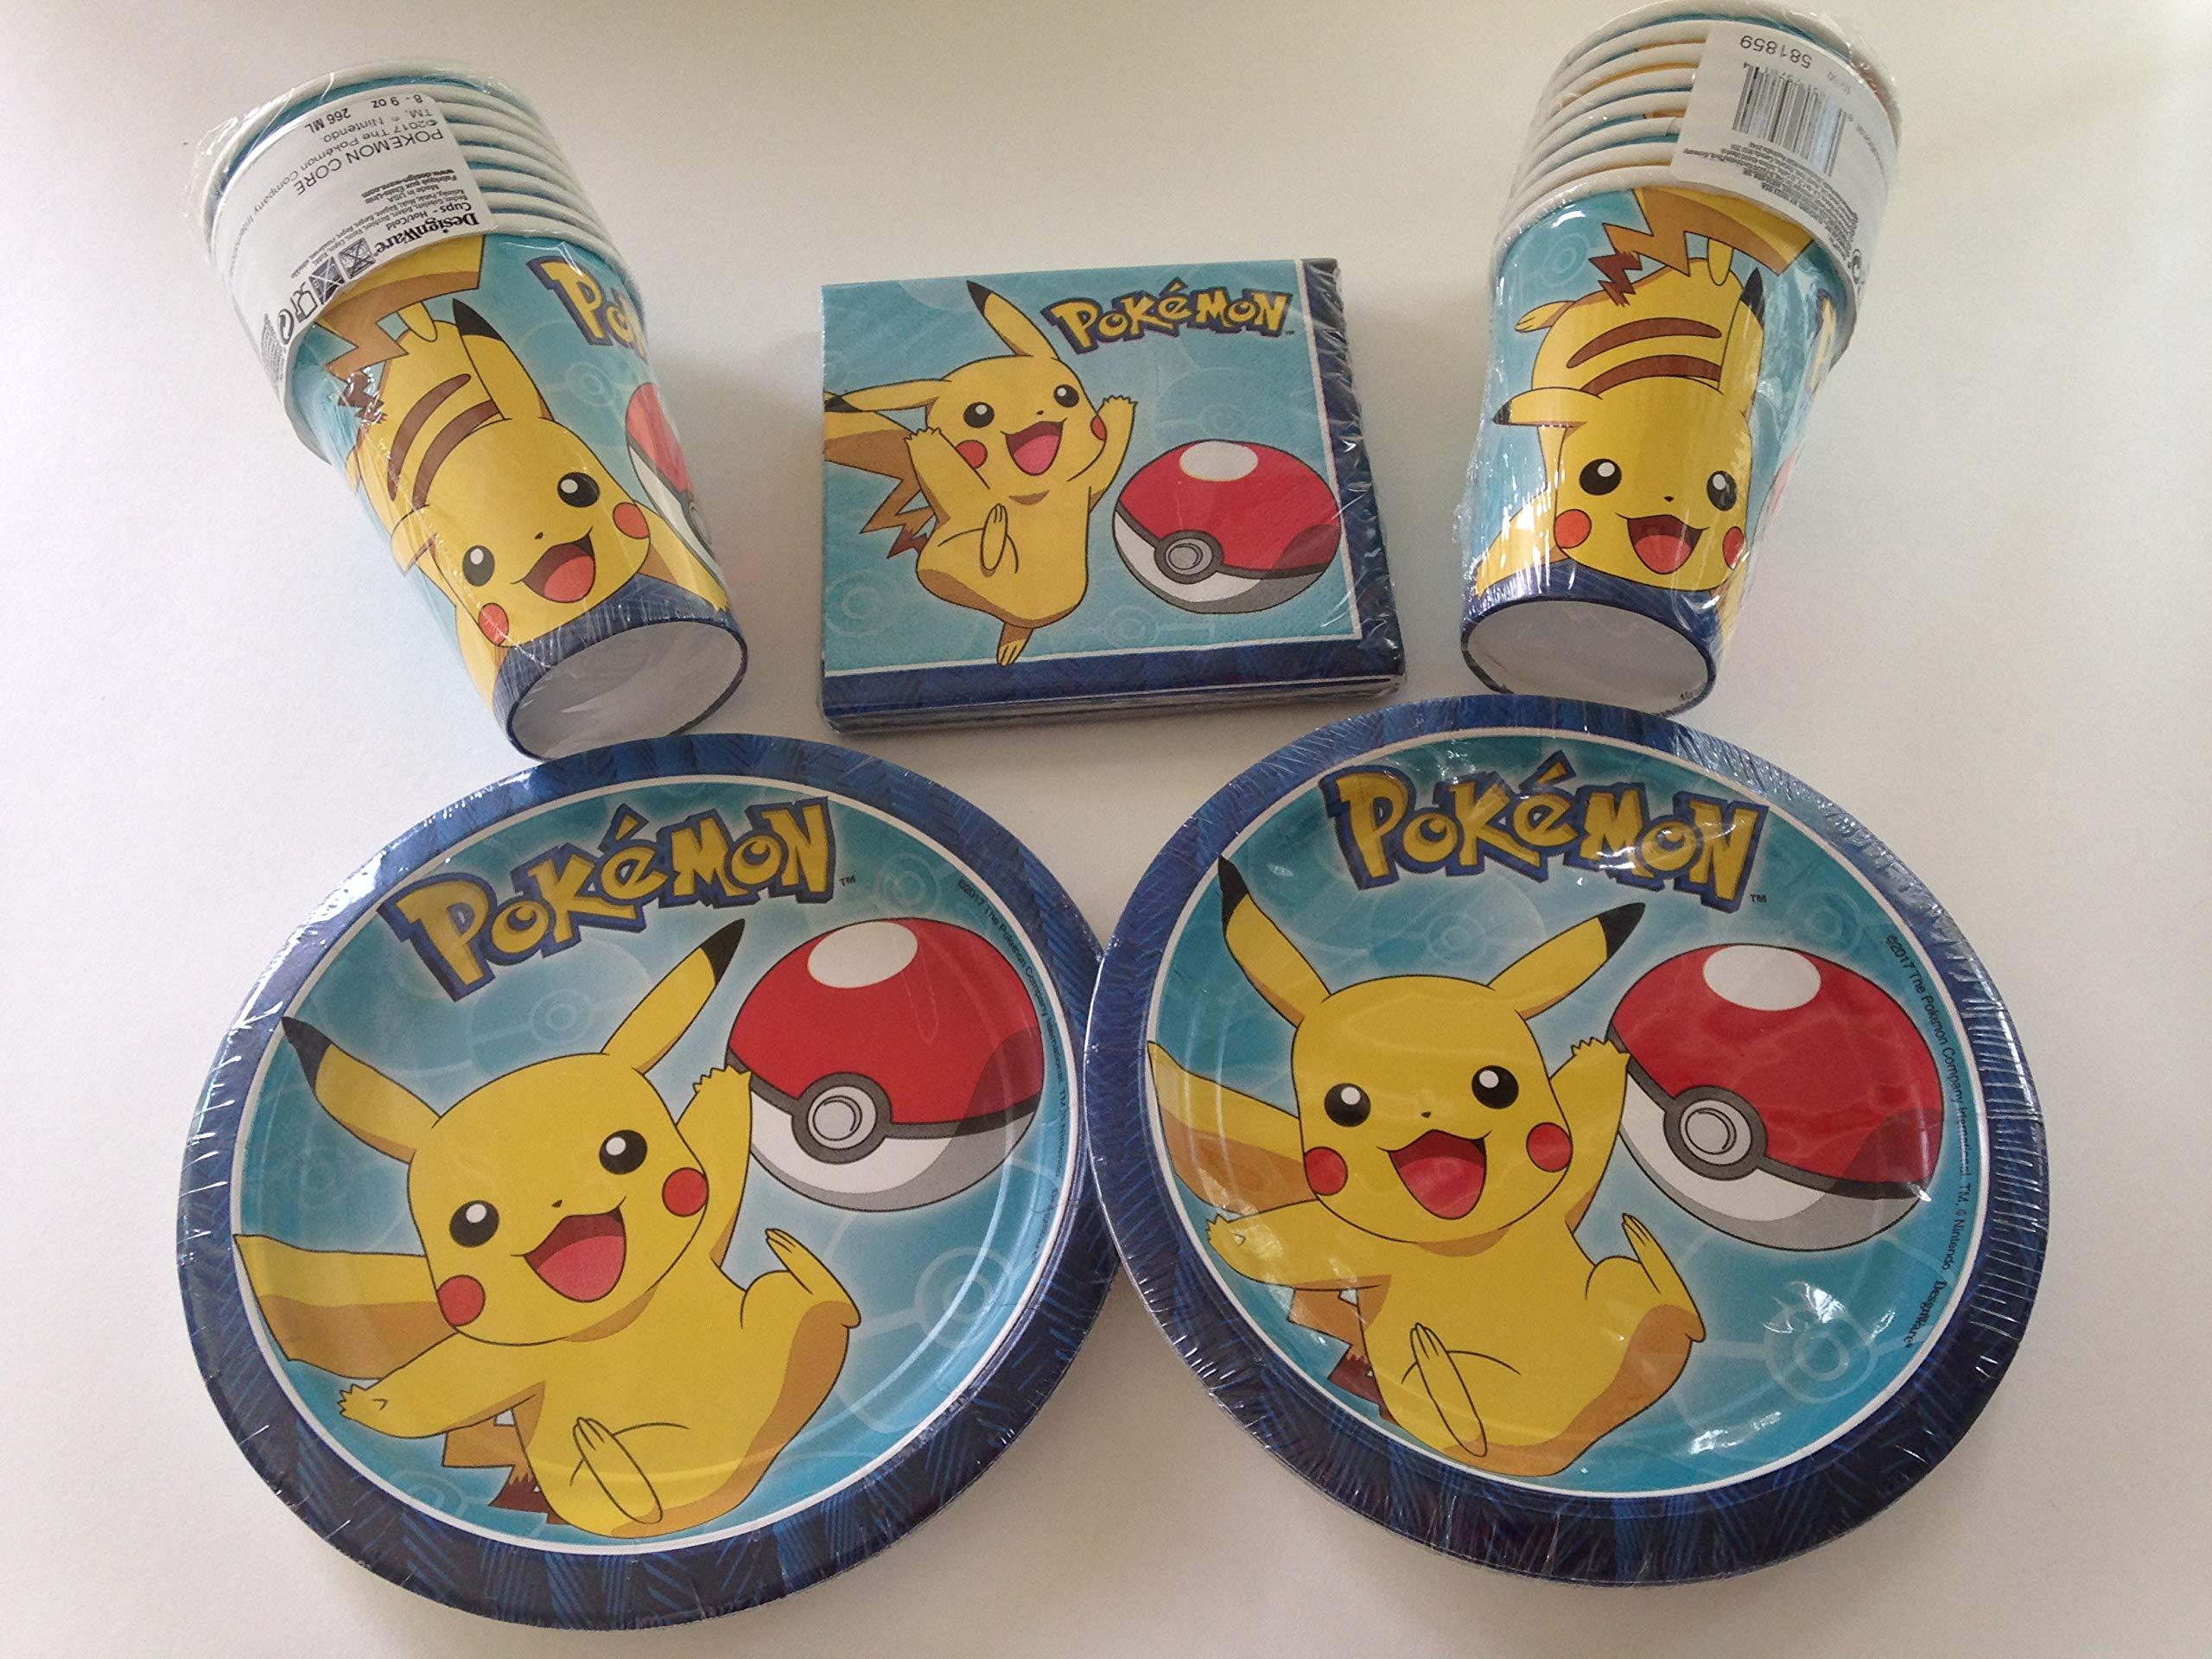 Pokemon Pikachu Party Bundle 7'' Plates (16) Cups (16) Napkins (16)